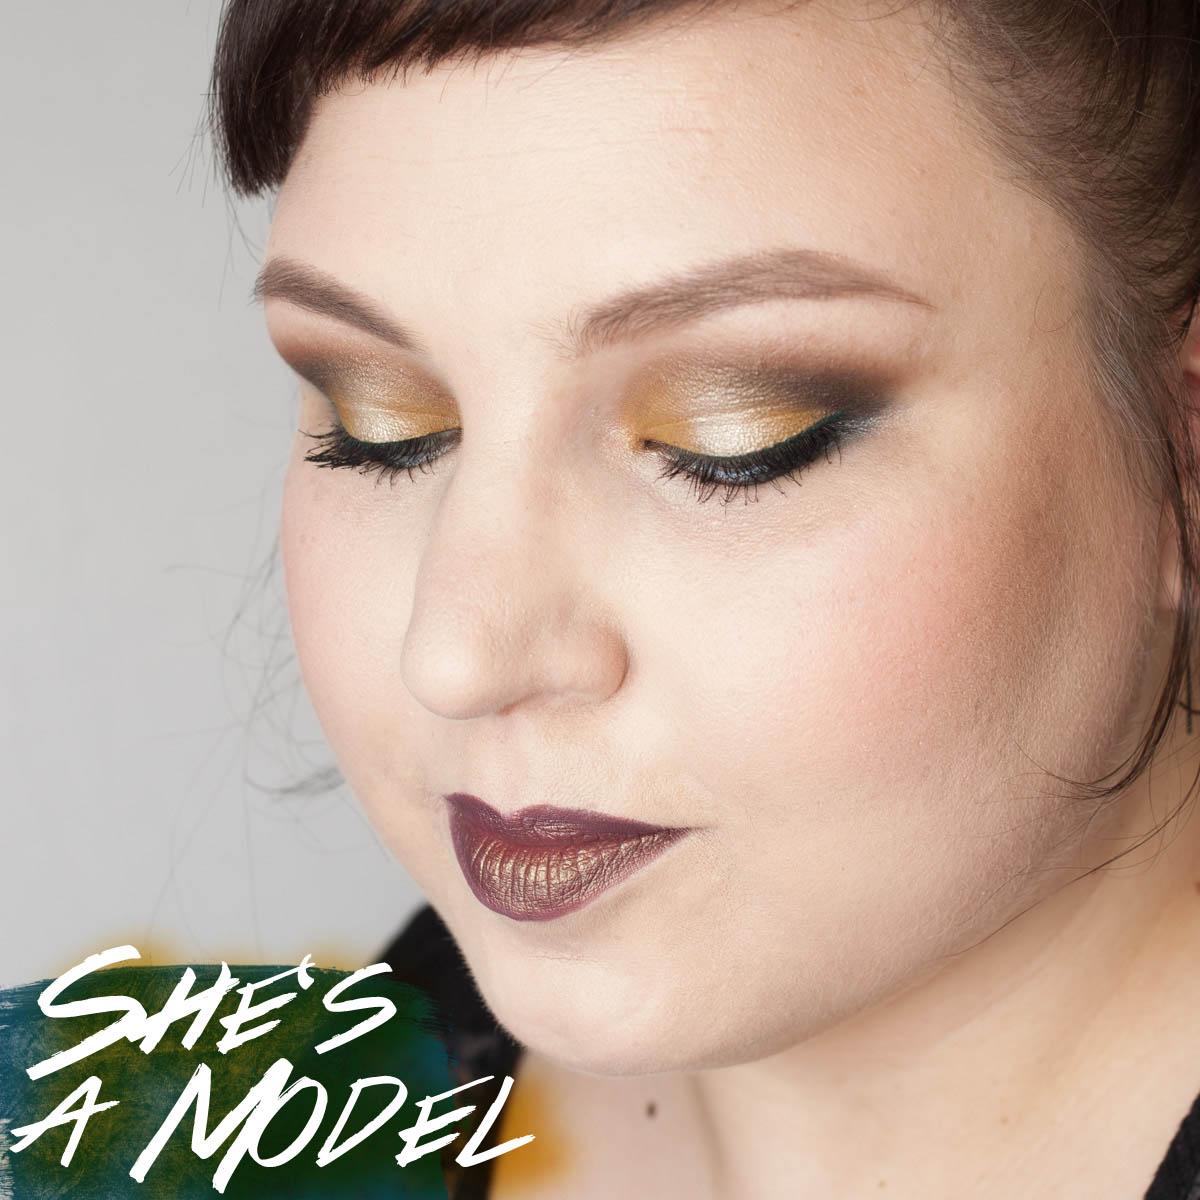 MAC Shes a Model Eyeshadow Palette Makeup LIME CRIME Beetle